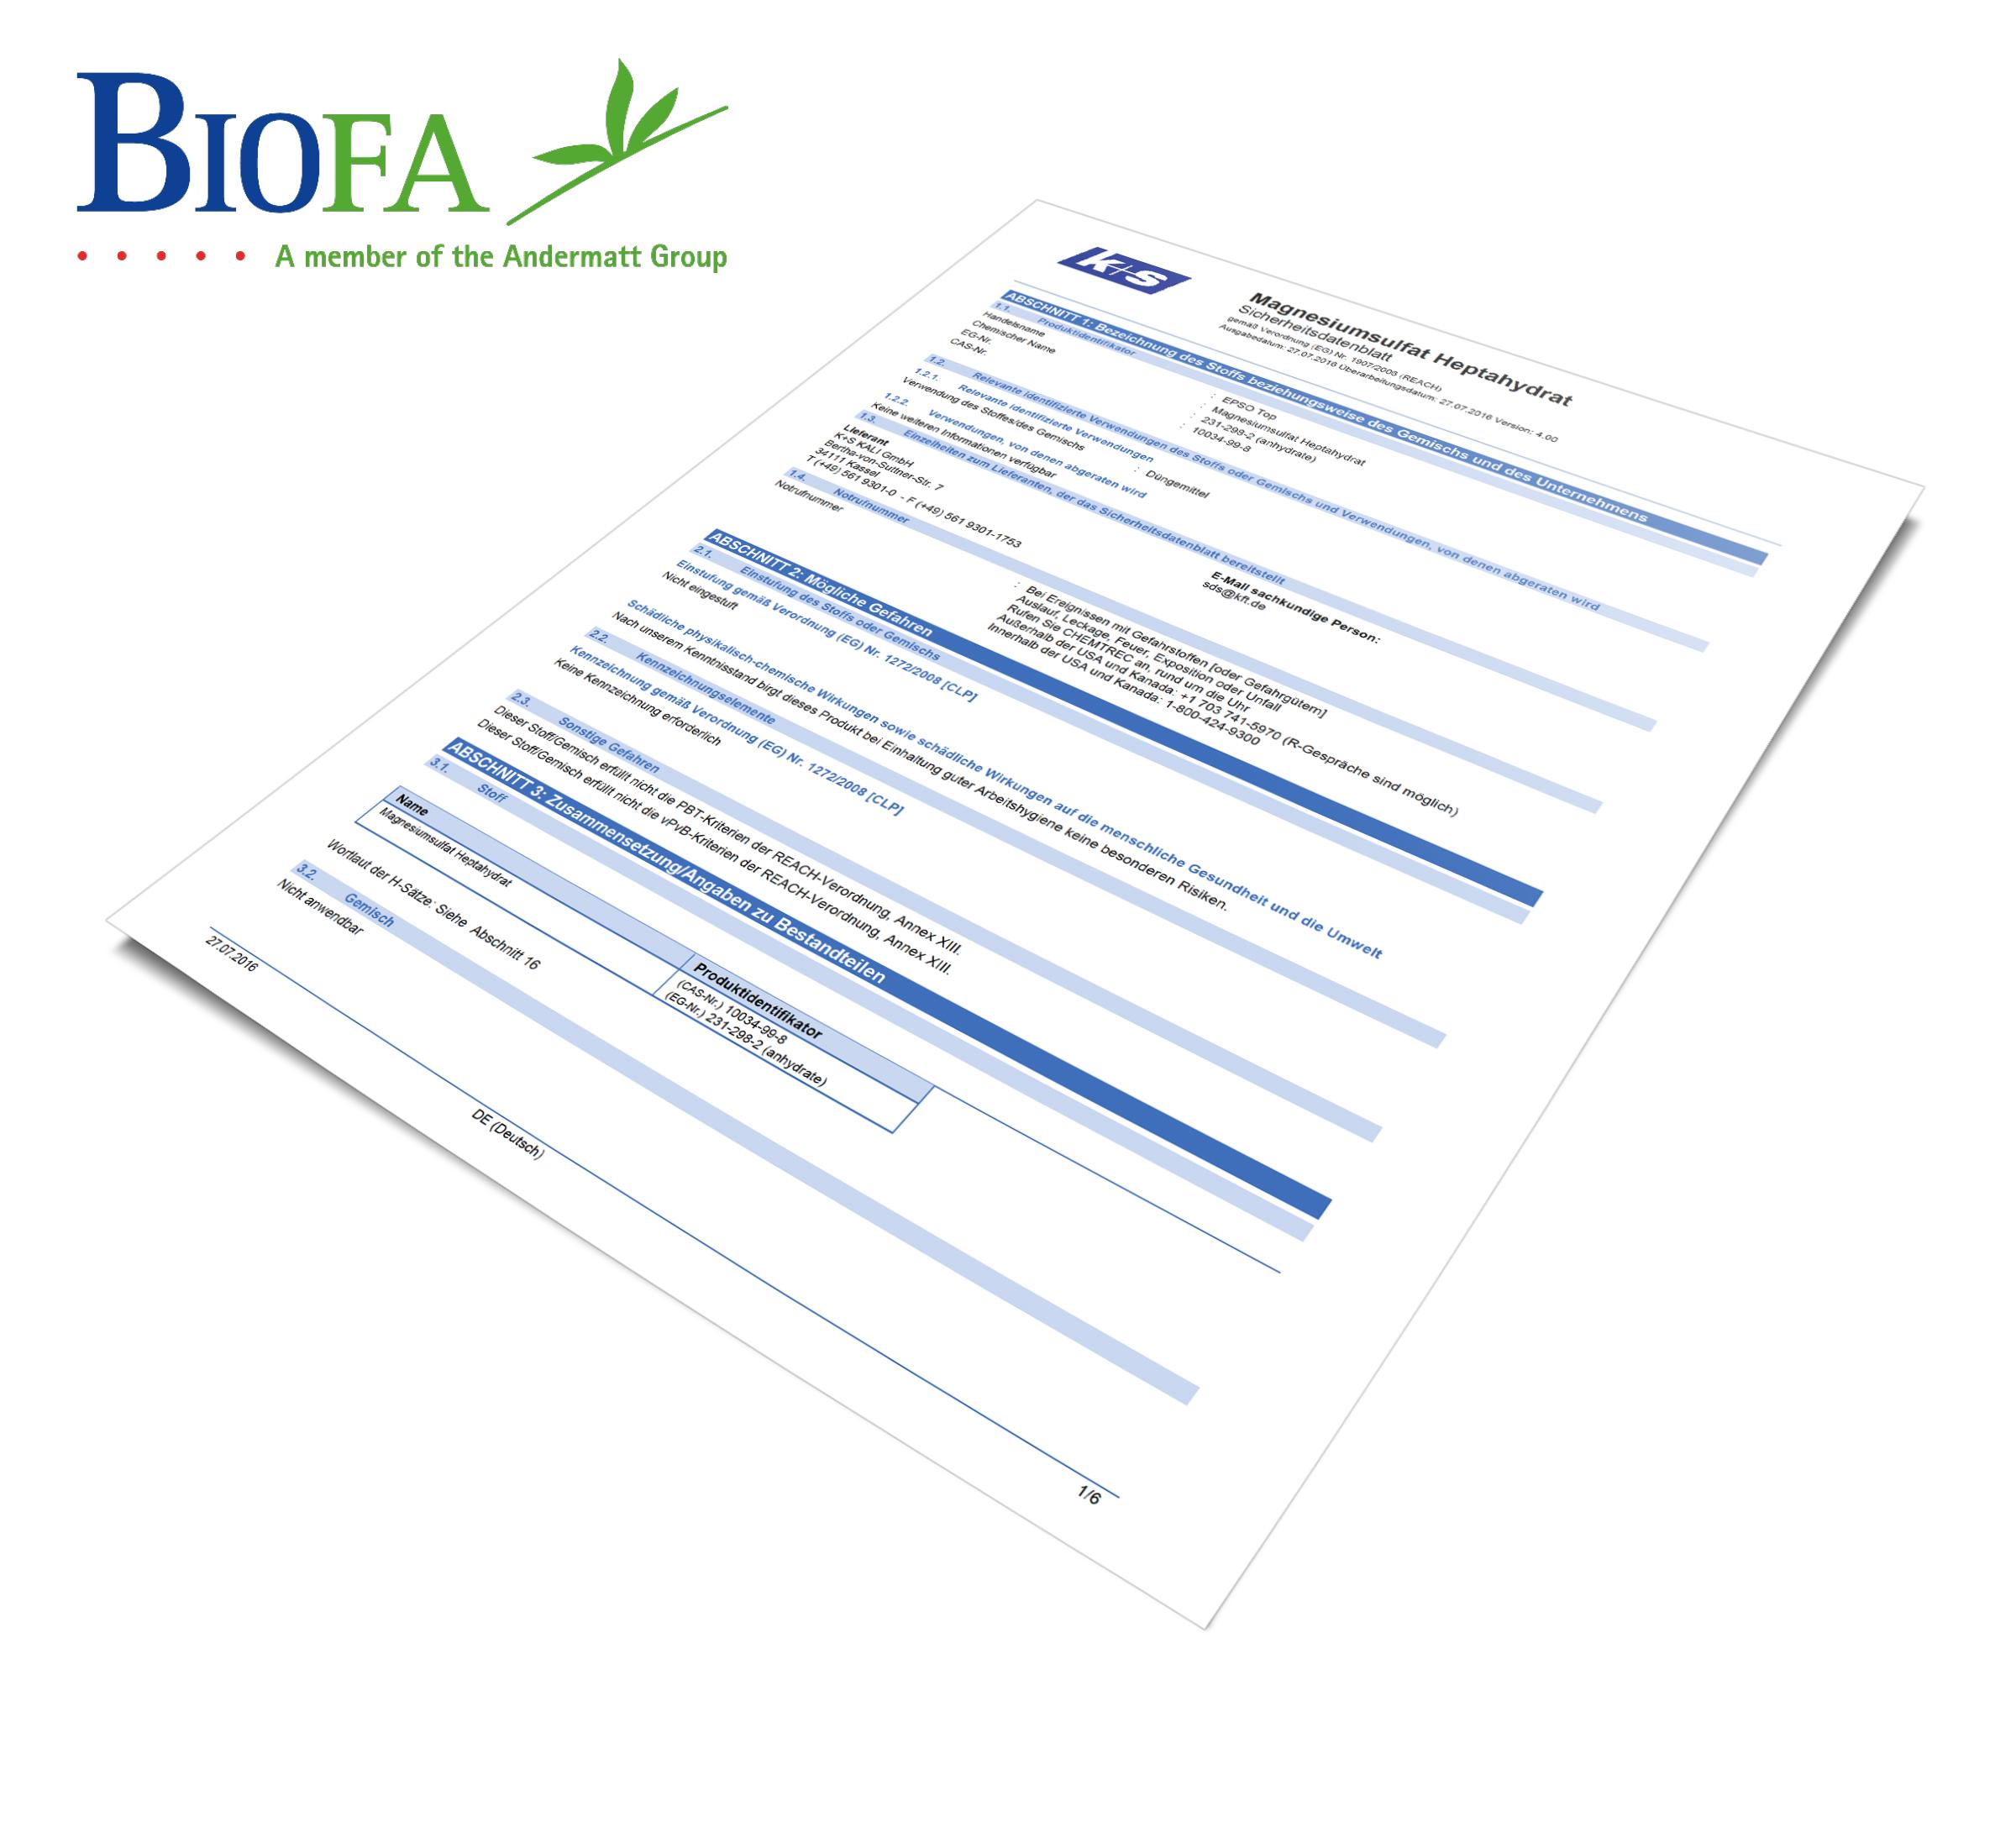 Biofa_Bittersalz_2021